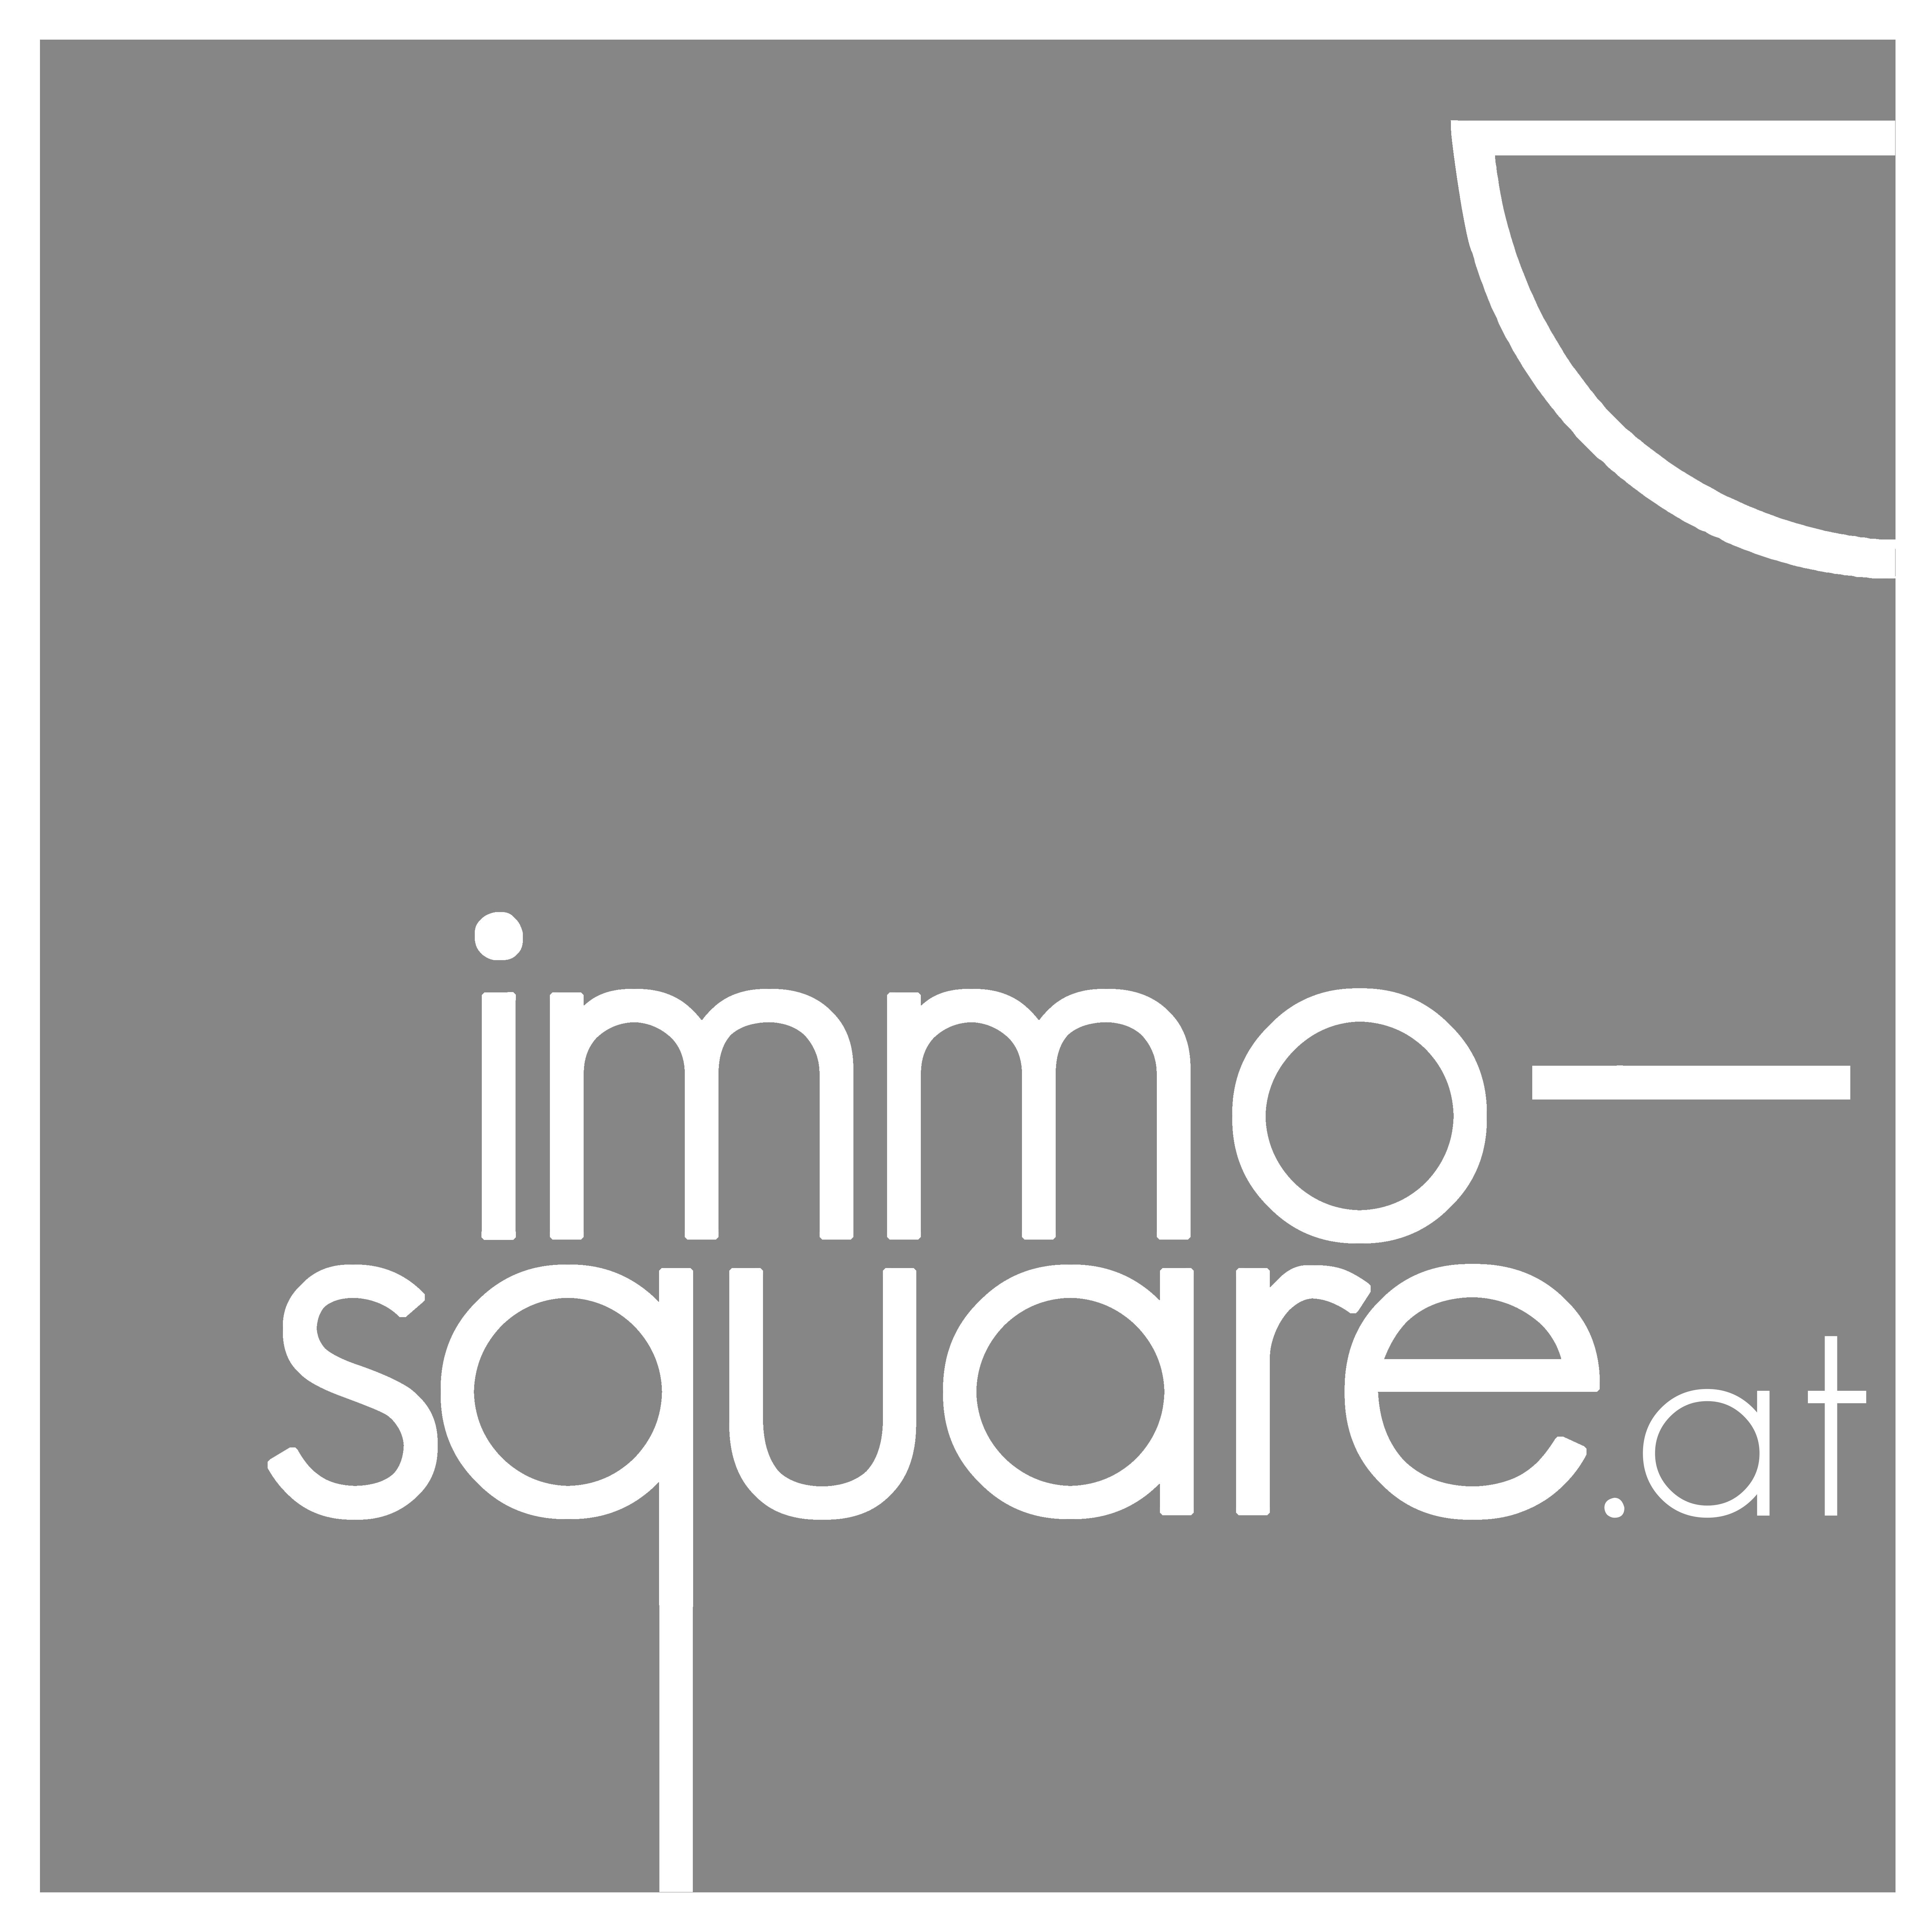 Immo-Square Immobilienreuhand GmbH Logo